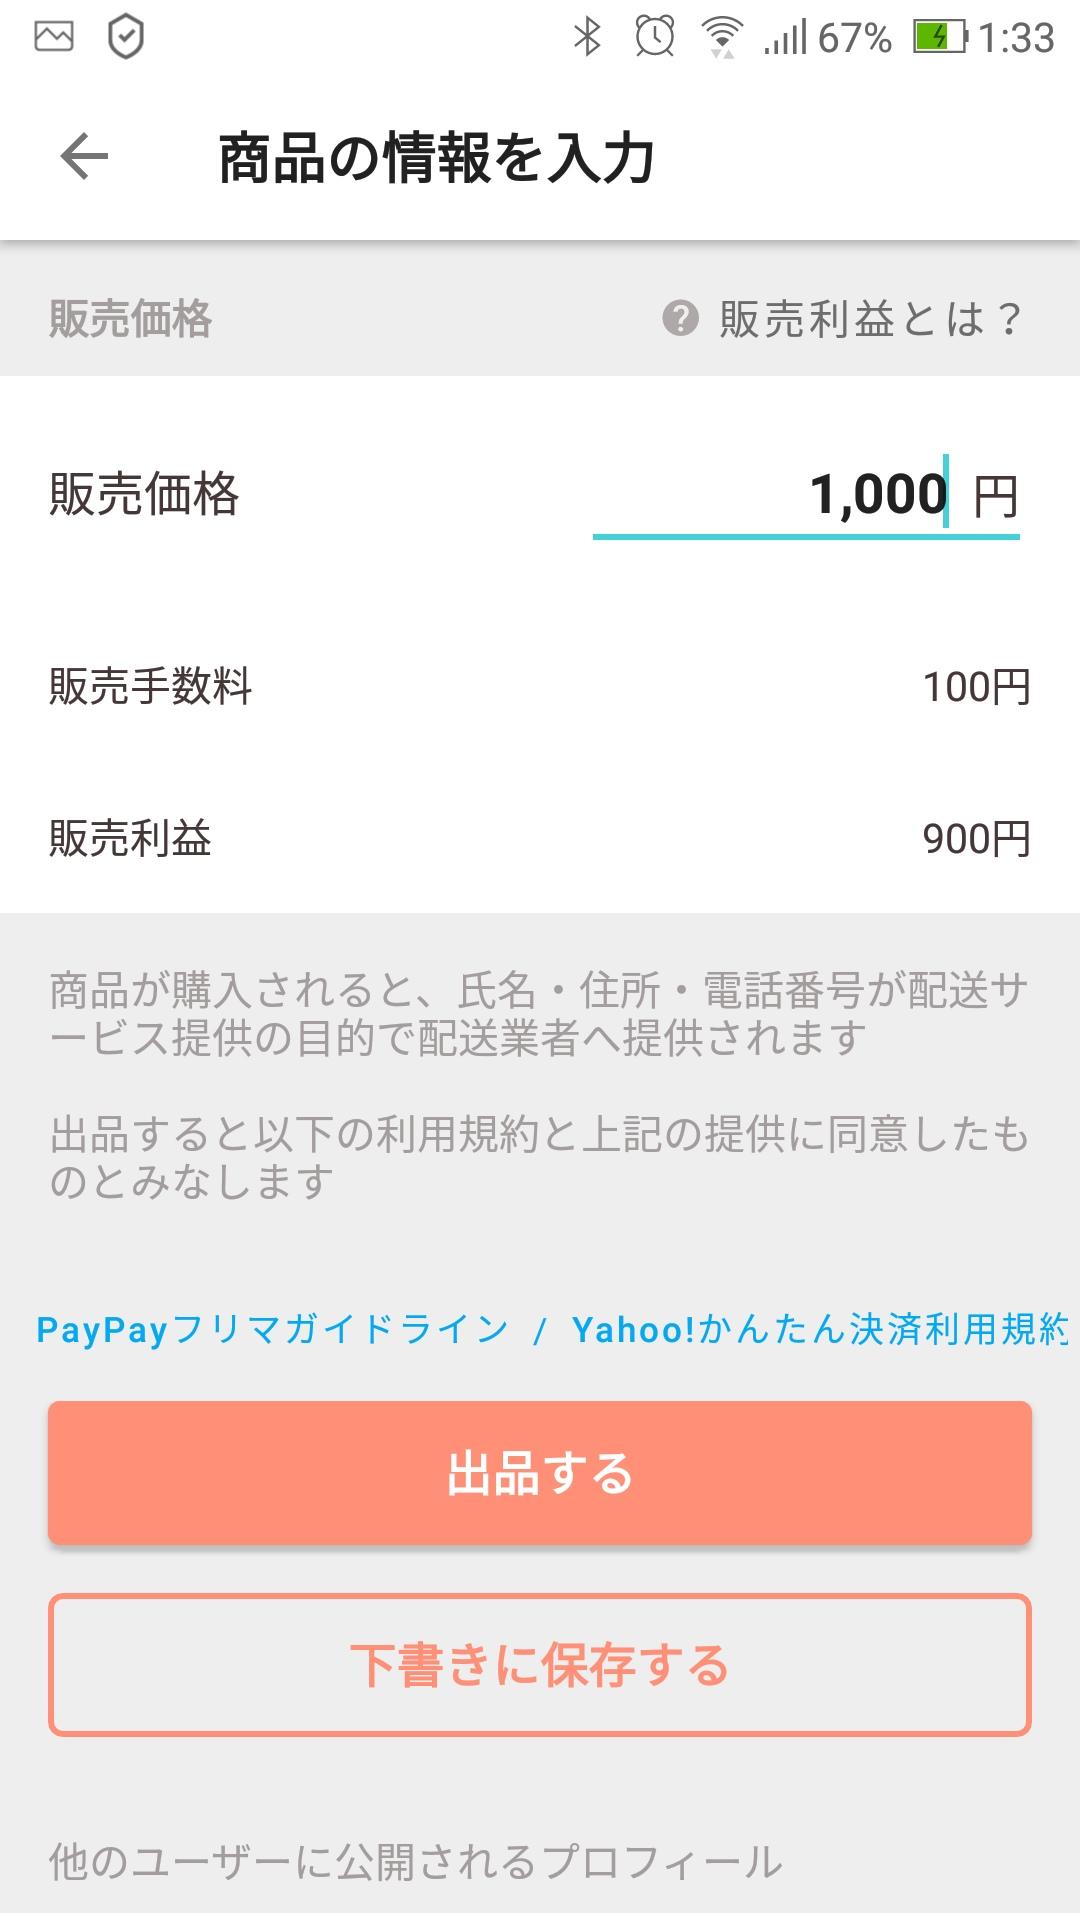 Paypayフリマ 出品の仕方 画像